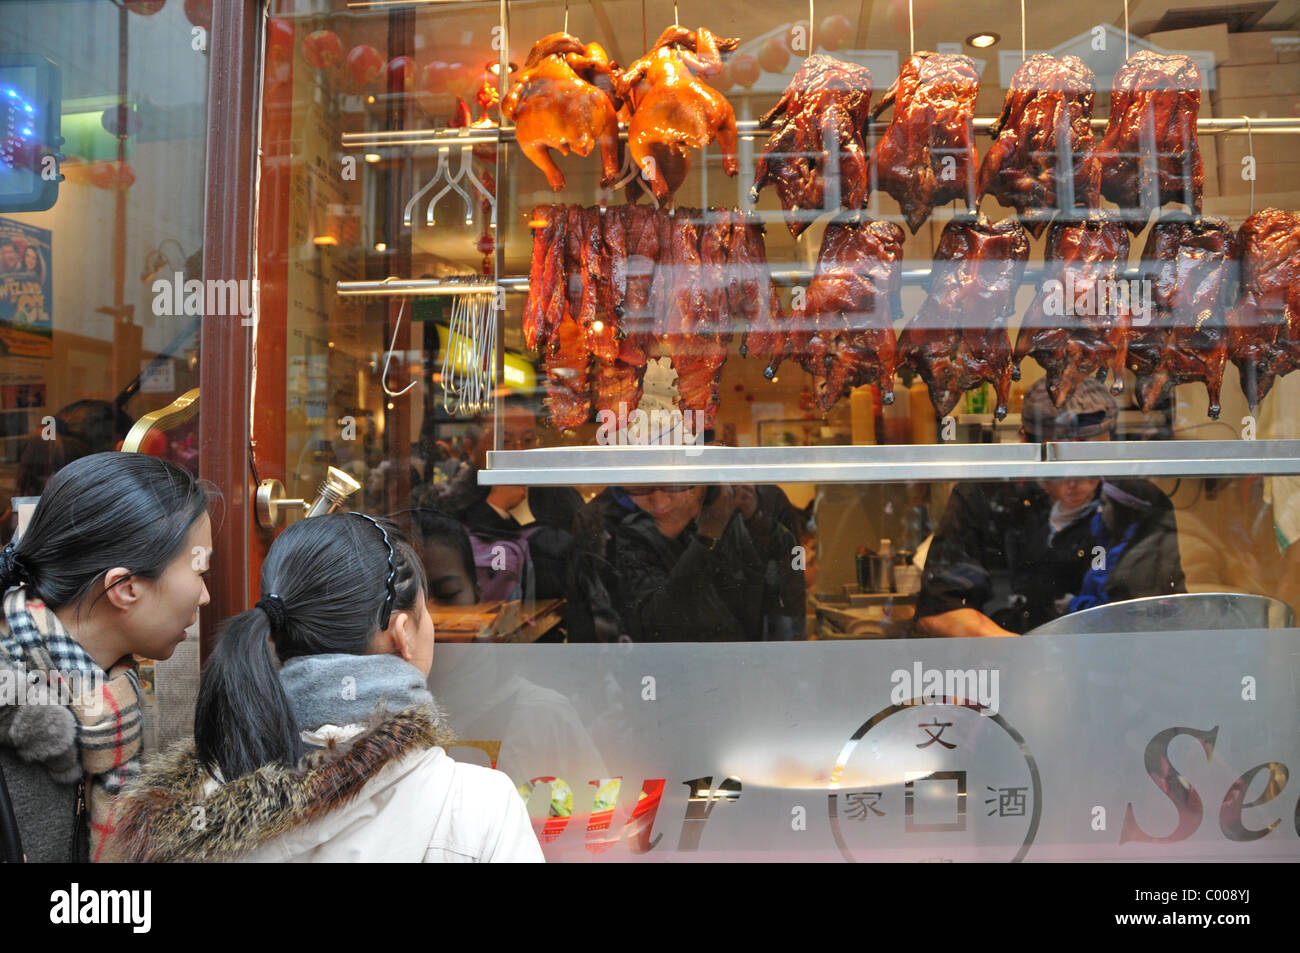 Crispy duck Chinese food roast duck chinatown Chinese New Year Celebrations Chinatown London - Stock Image